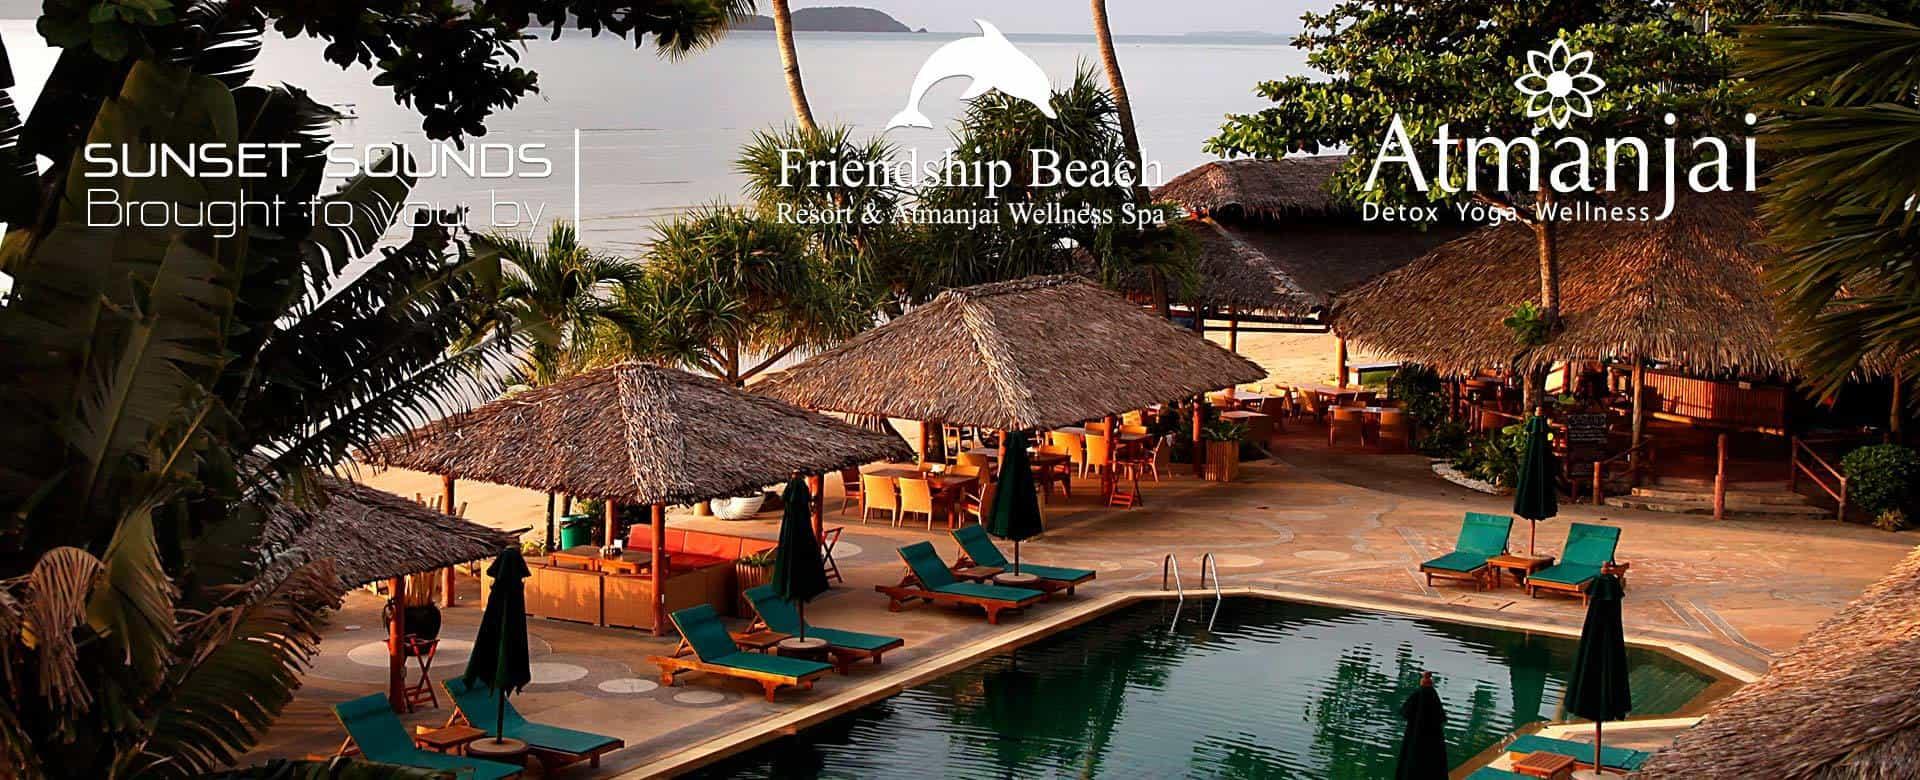 Sunset Sounds Sponsored by Friendship Beach and Atmanjai Wellness Spa Phuket